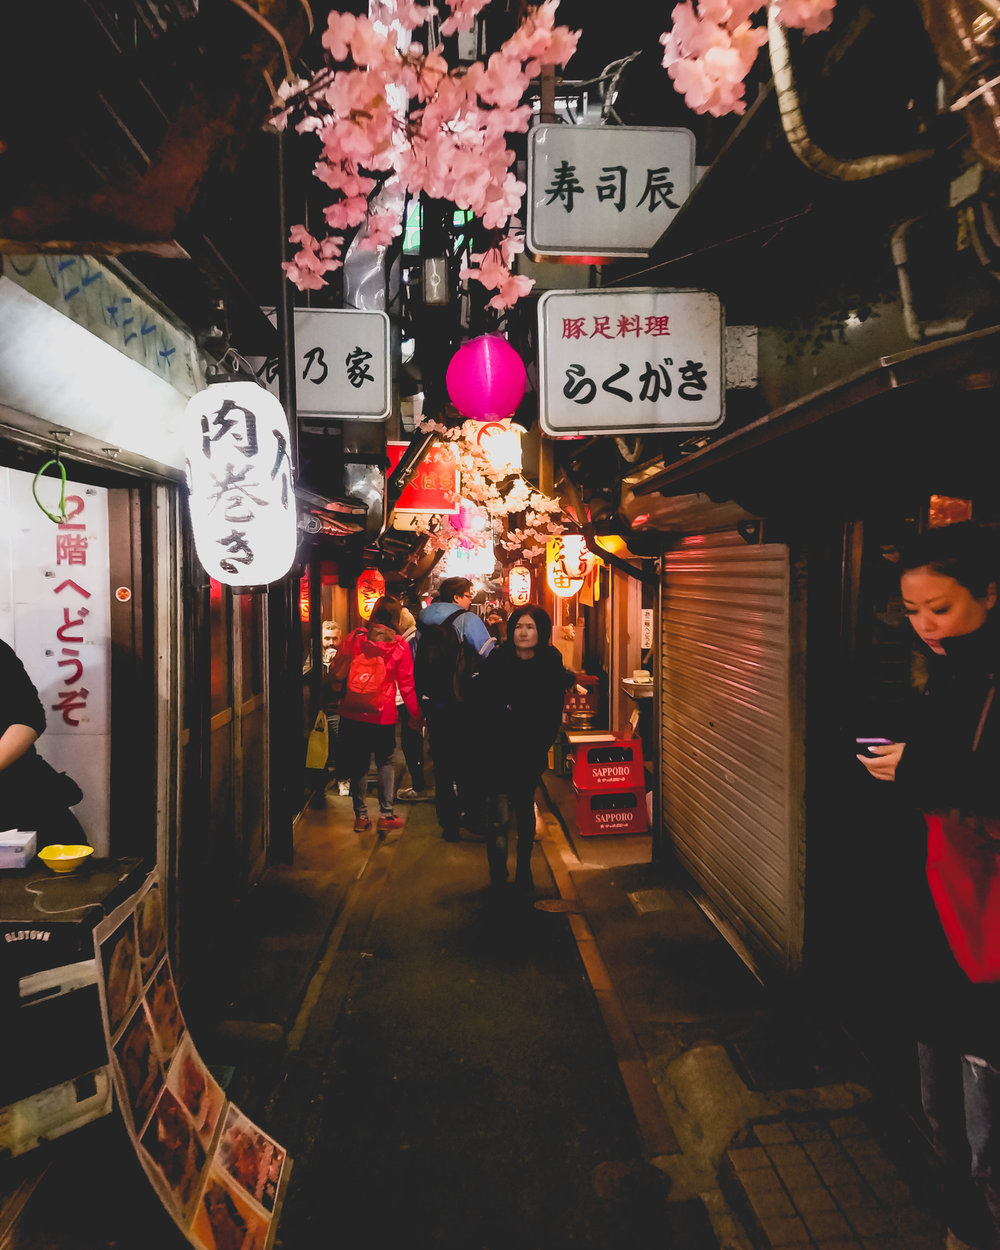 yokocho (food alley) under the train tracks at shinjuku.